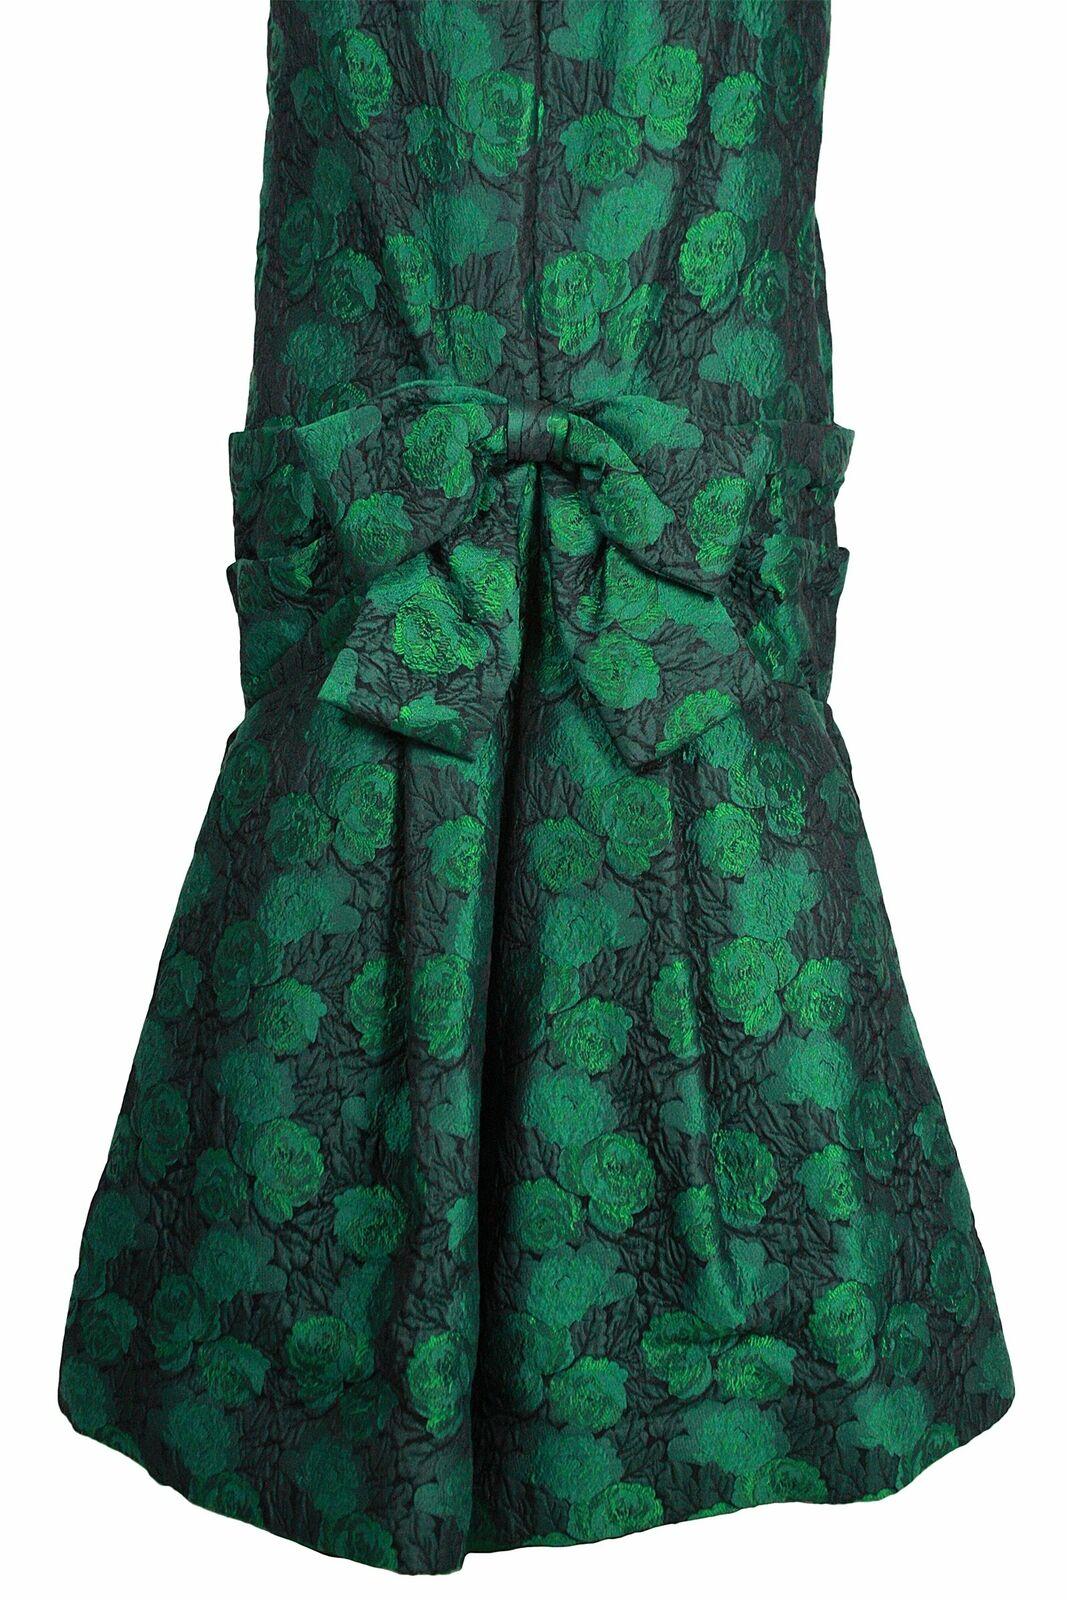 ARNOLD SCAASI 1980s Dark Green Floral Brocade Gow… - image 11